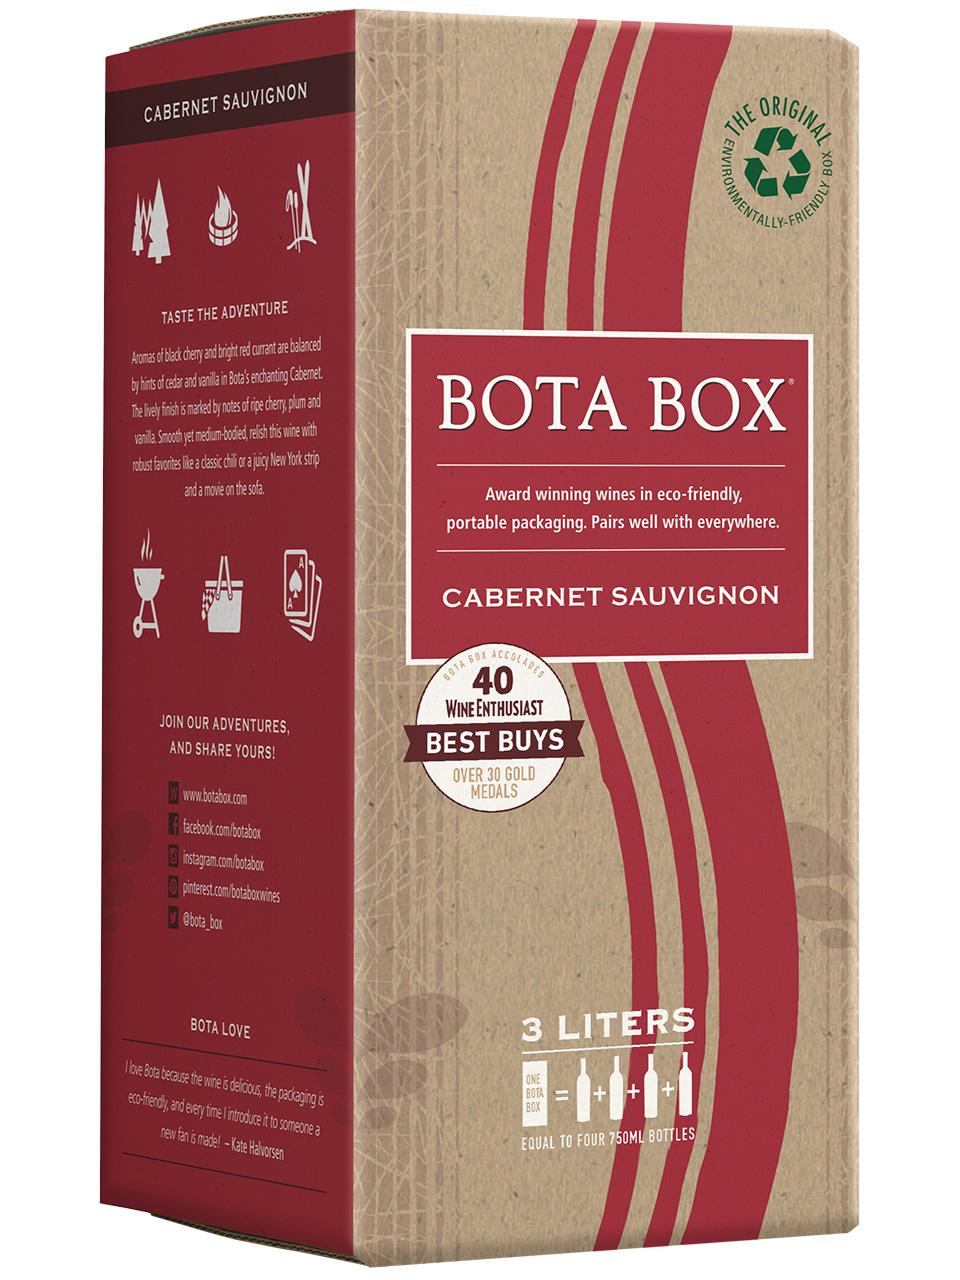 Bota Box Cabernet Sauvignon